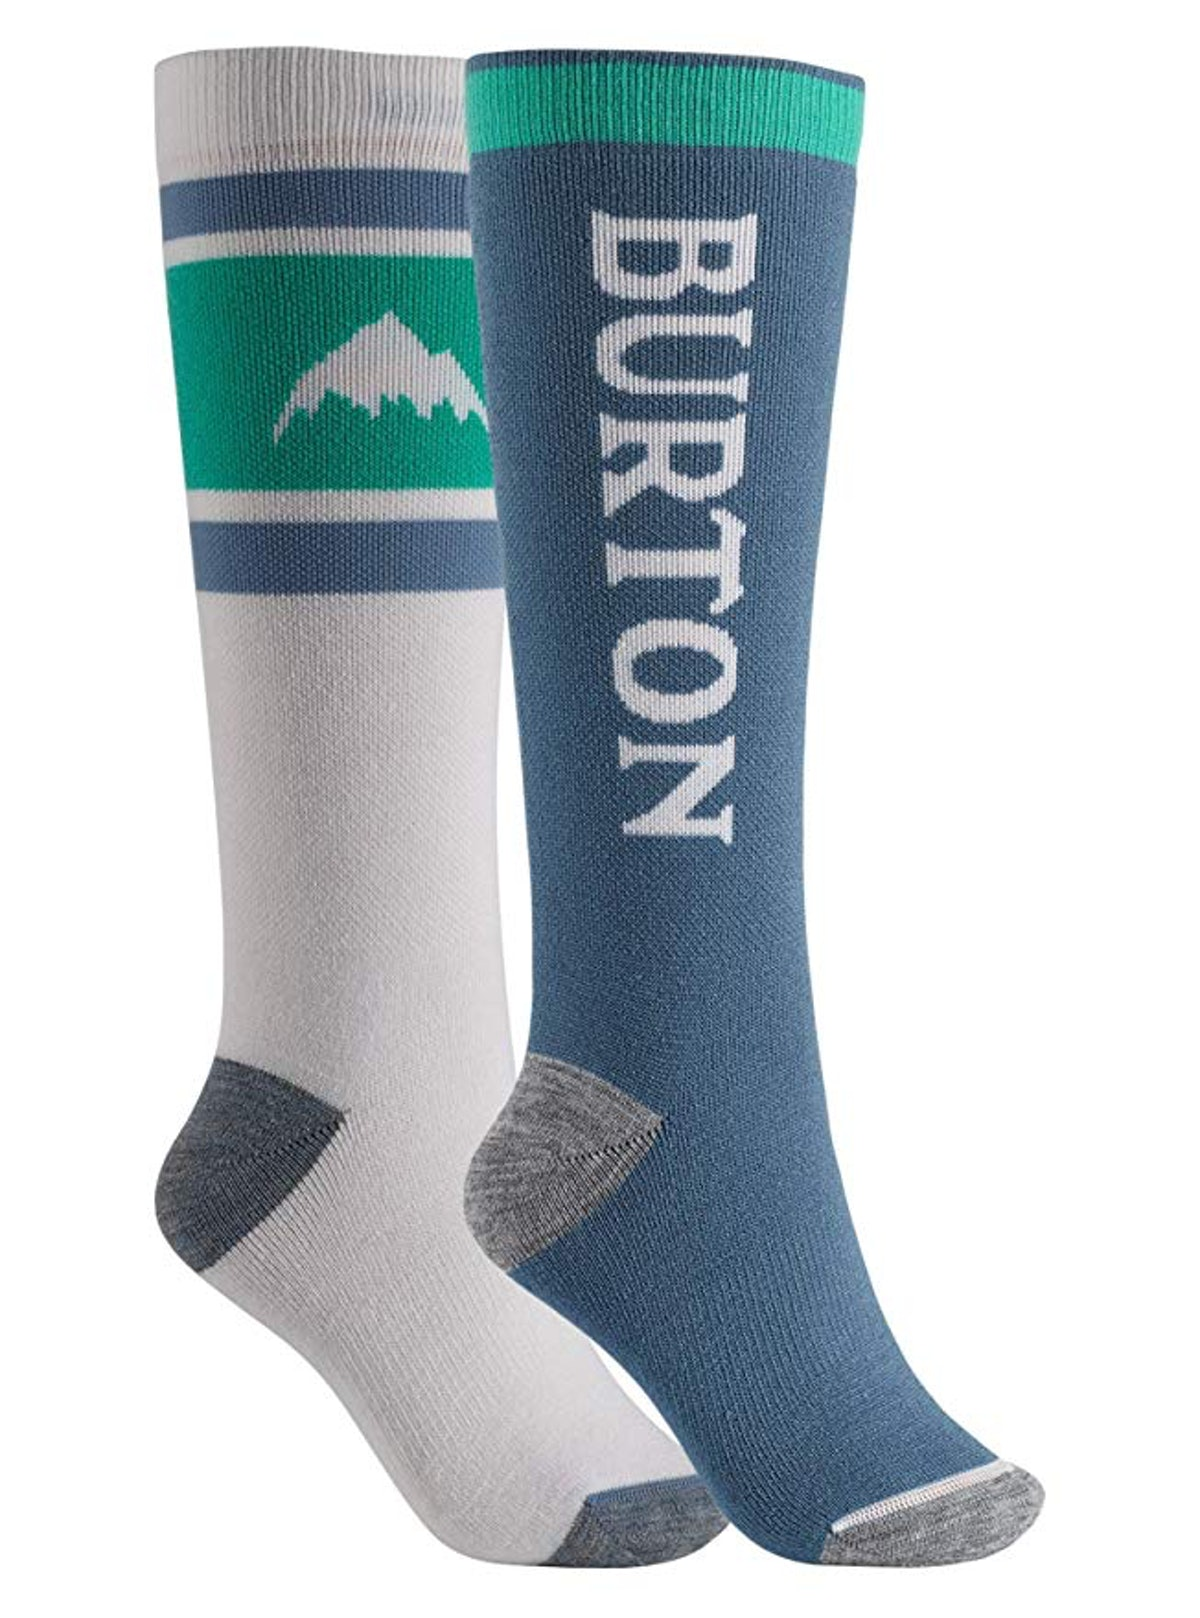 Burton Women's Weekend Midweight Socks (2-Pack)